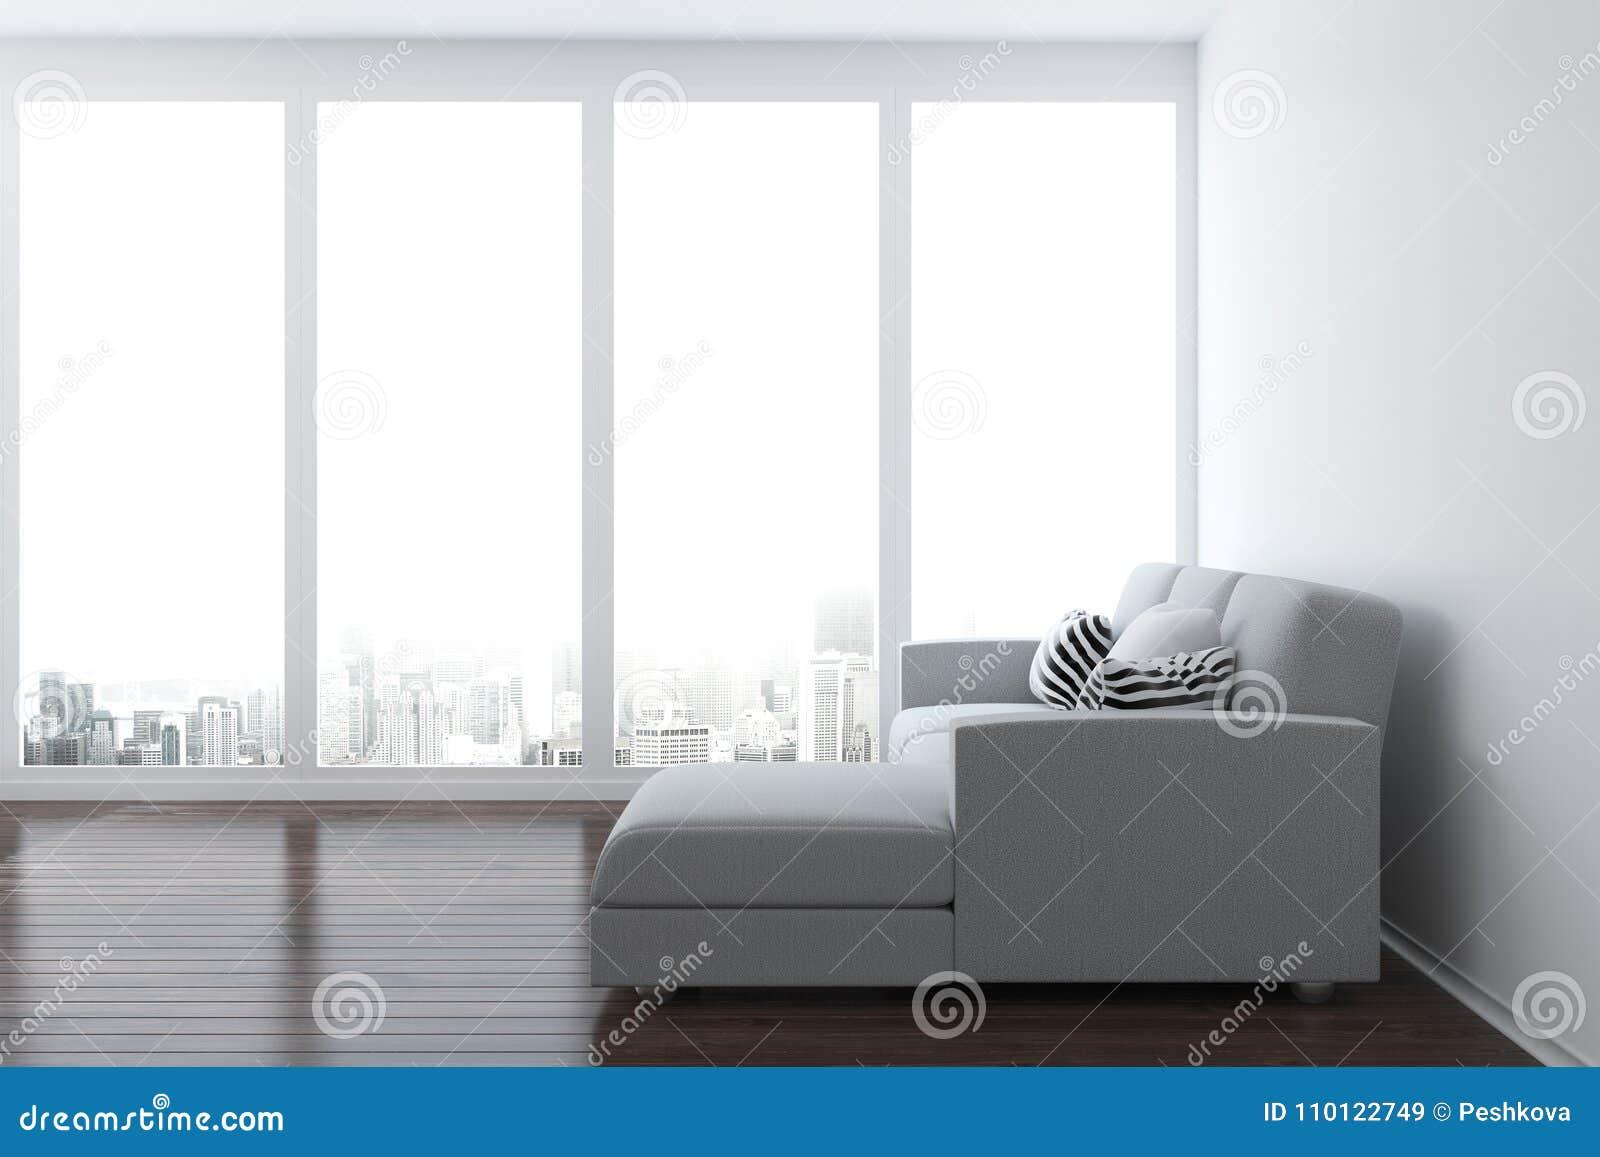 Clean living room stock illustration. Illustration of inside - 110122749